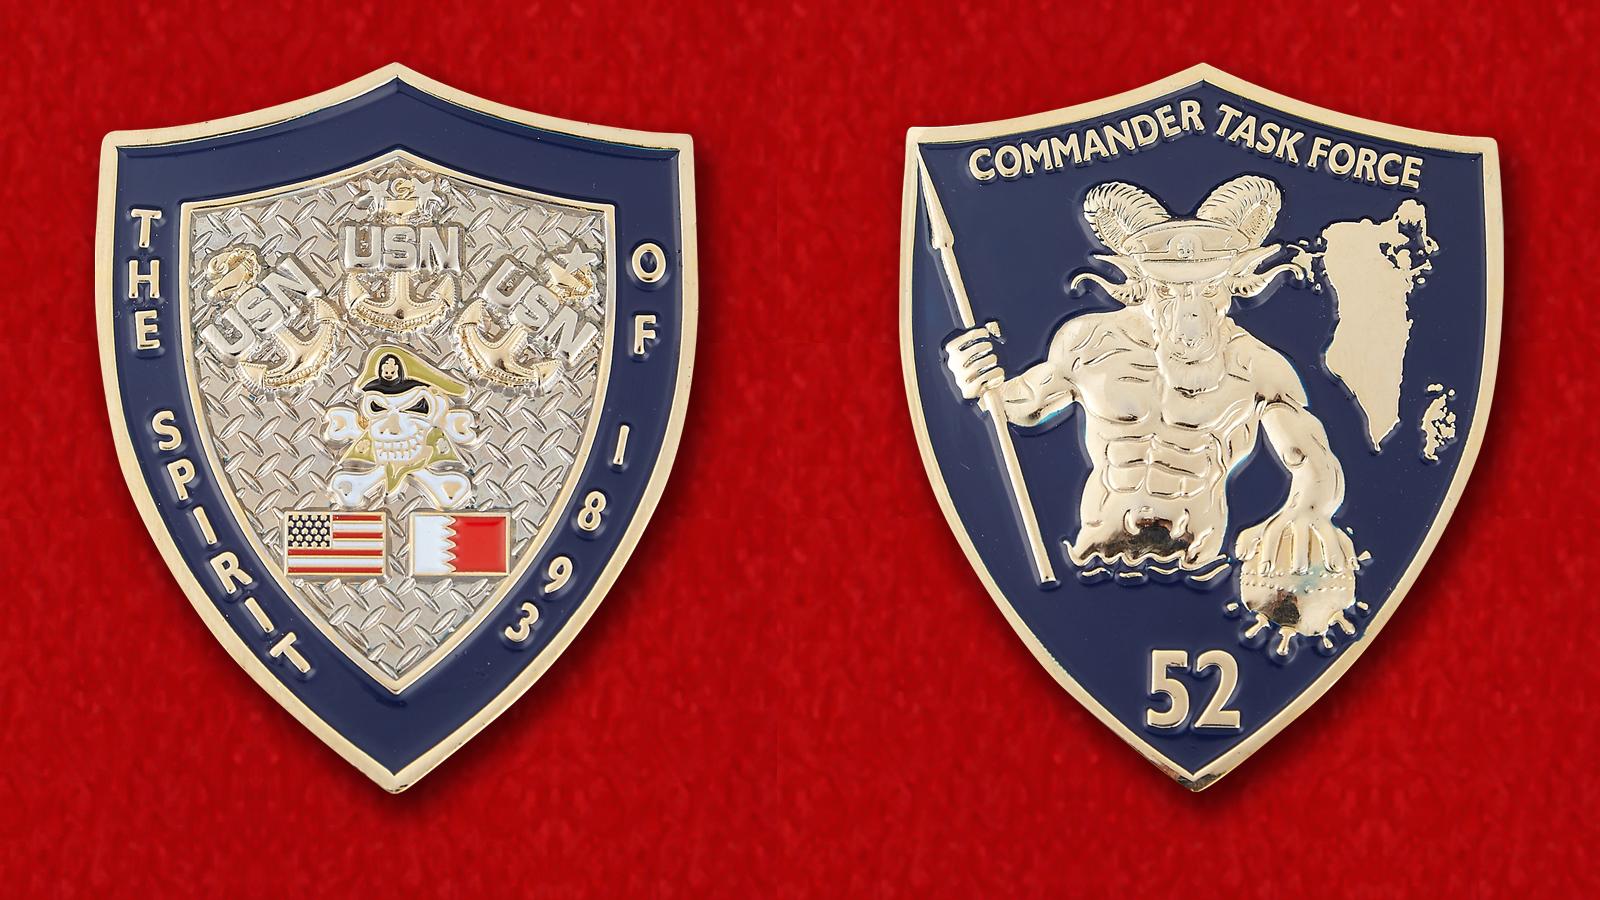 Челлендж коин командира 52-го оперативного соединения ВМС США